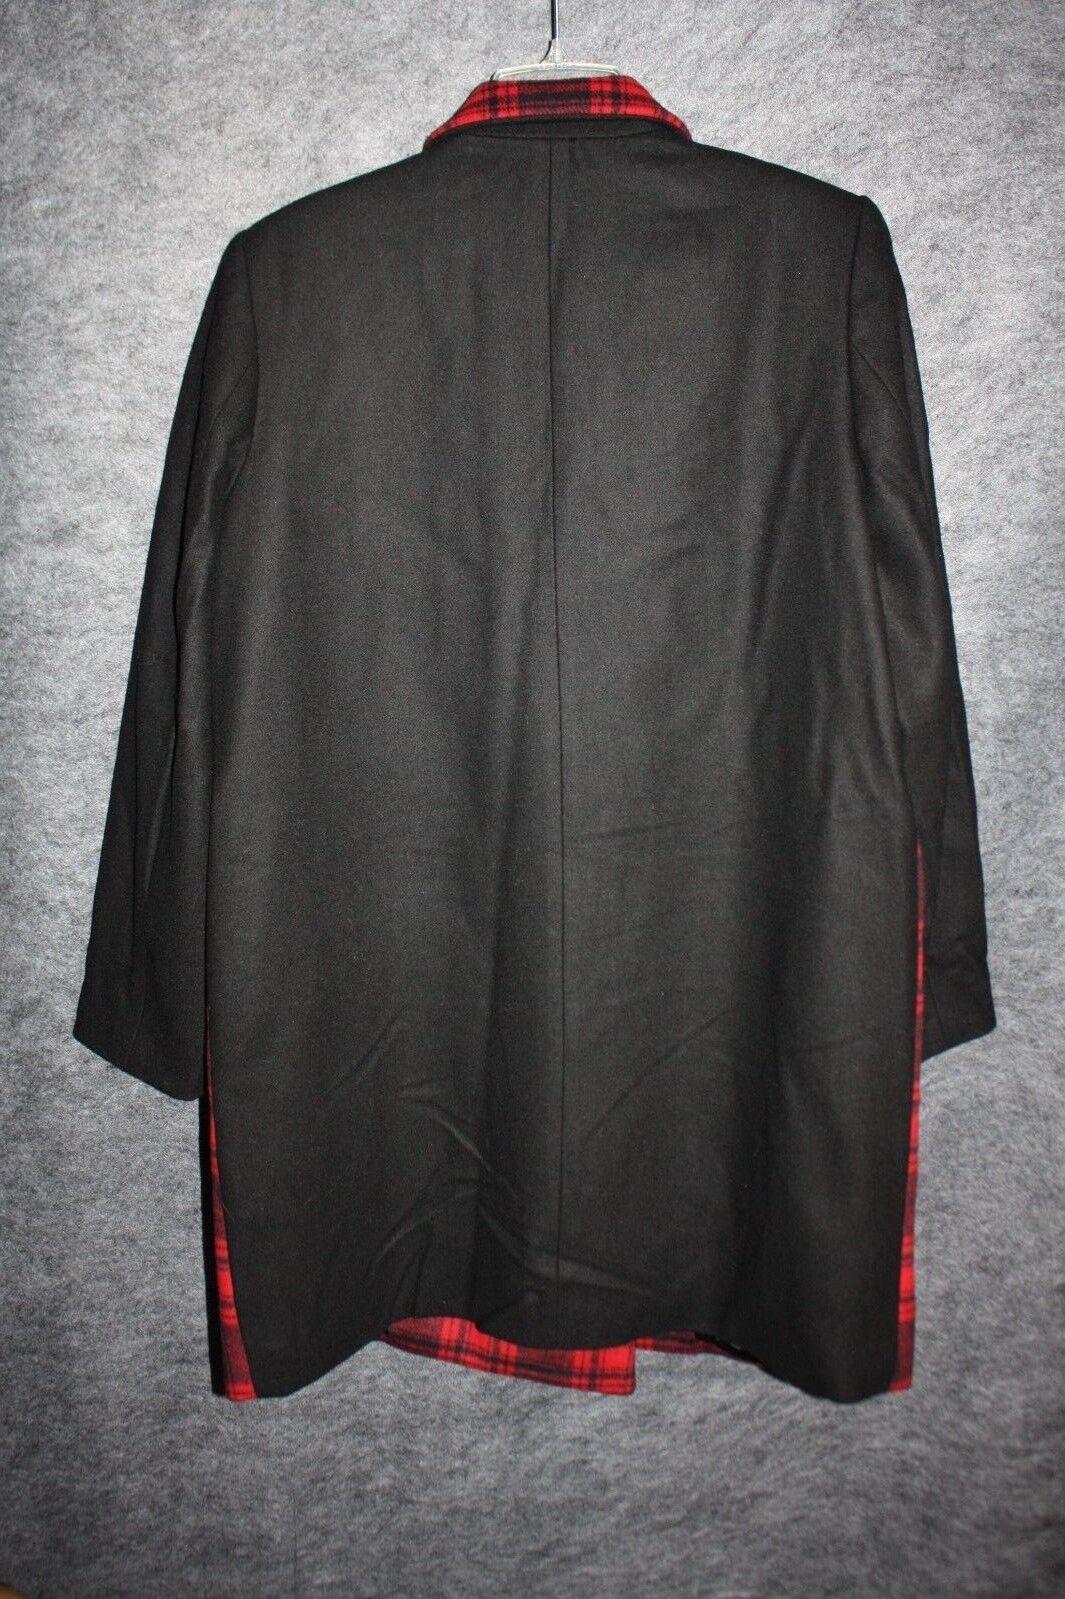 Gap Women's Festive Plaid Plaid Plaid Wool Car Red Coat L Large 5bd5f5